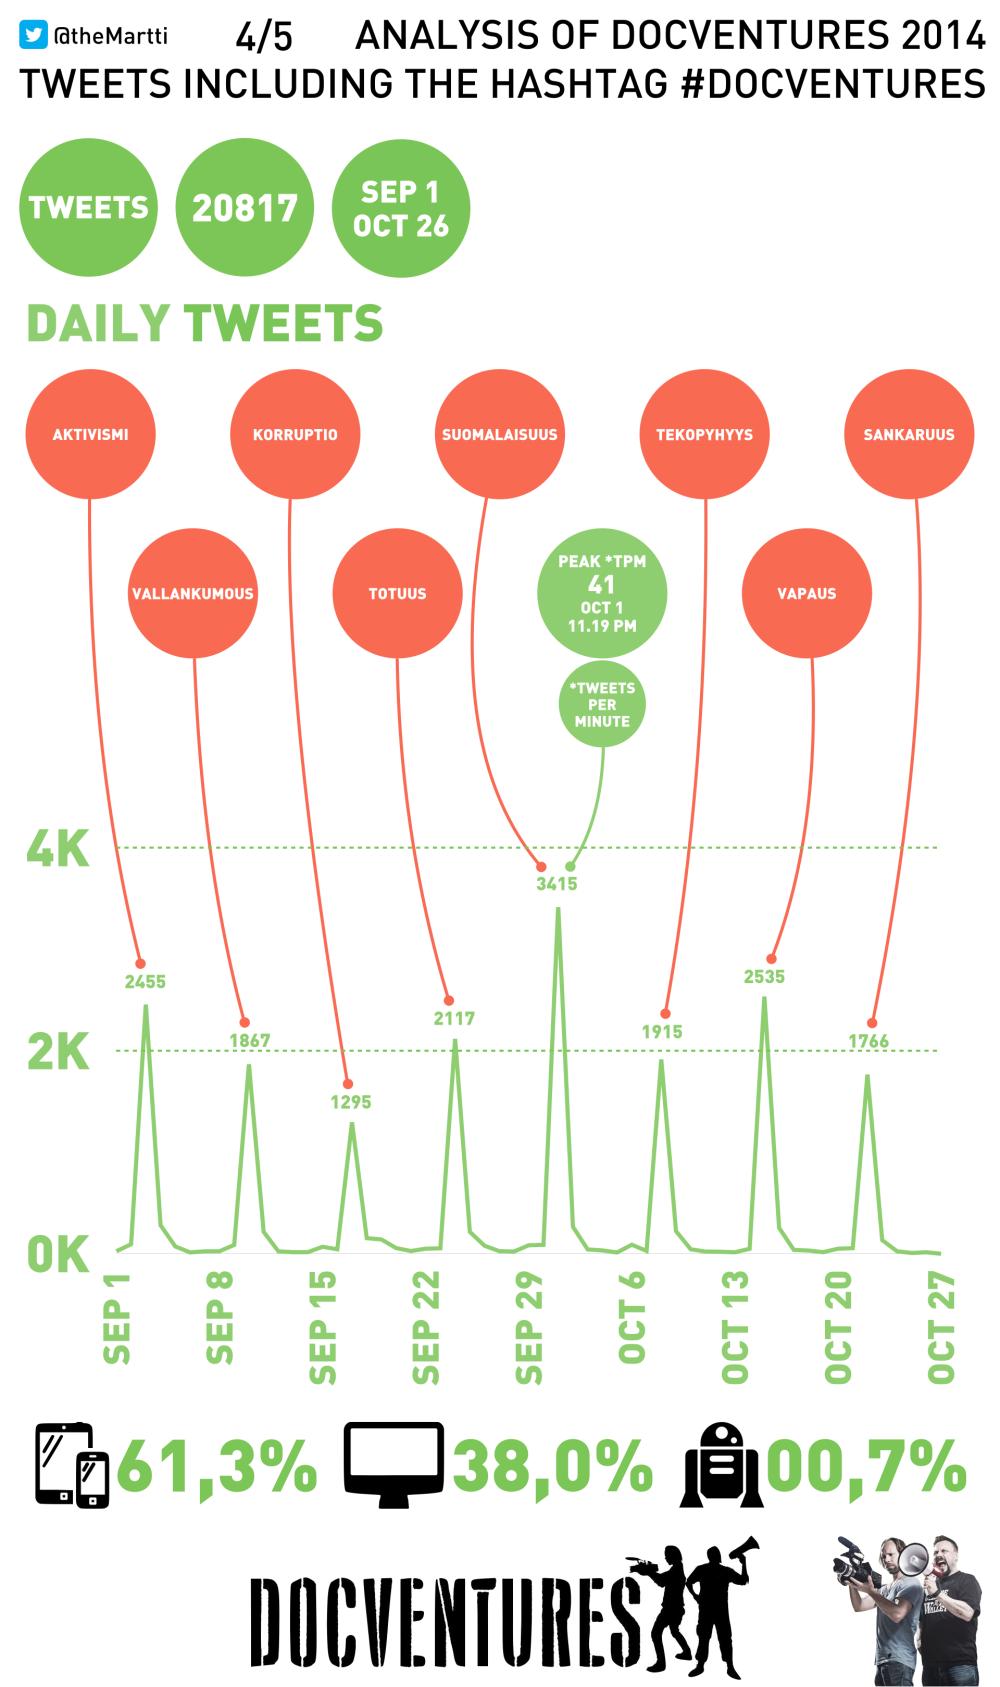 theMartti Analysis Docventures 2014 004